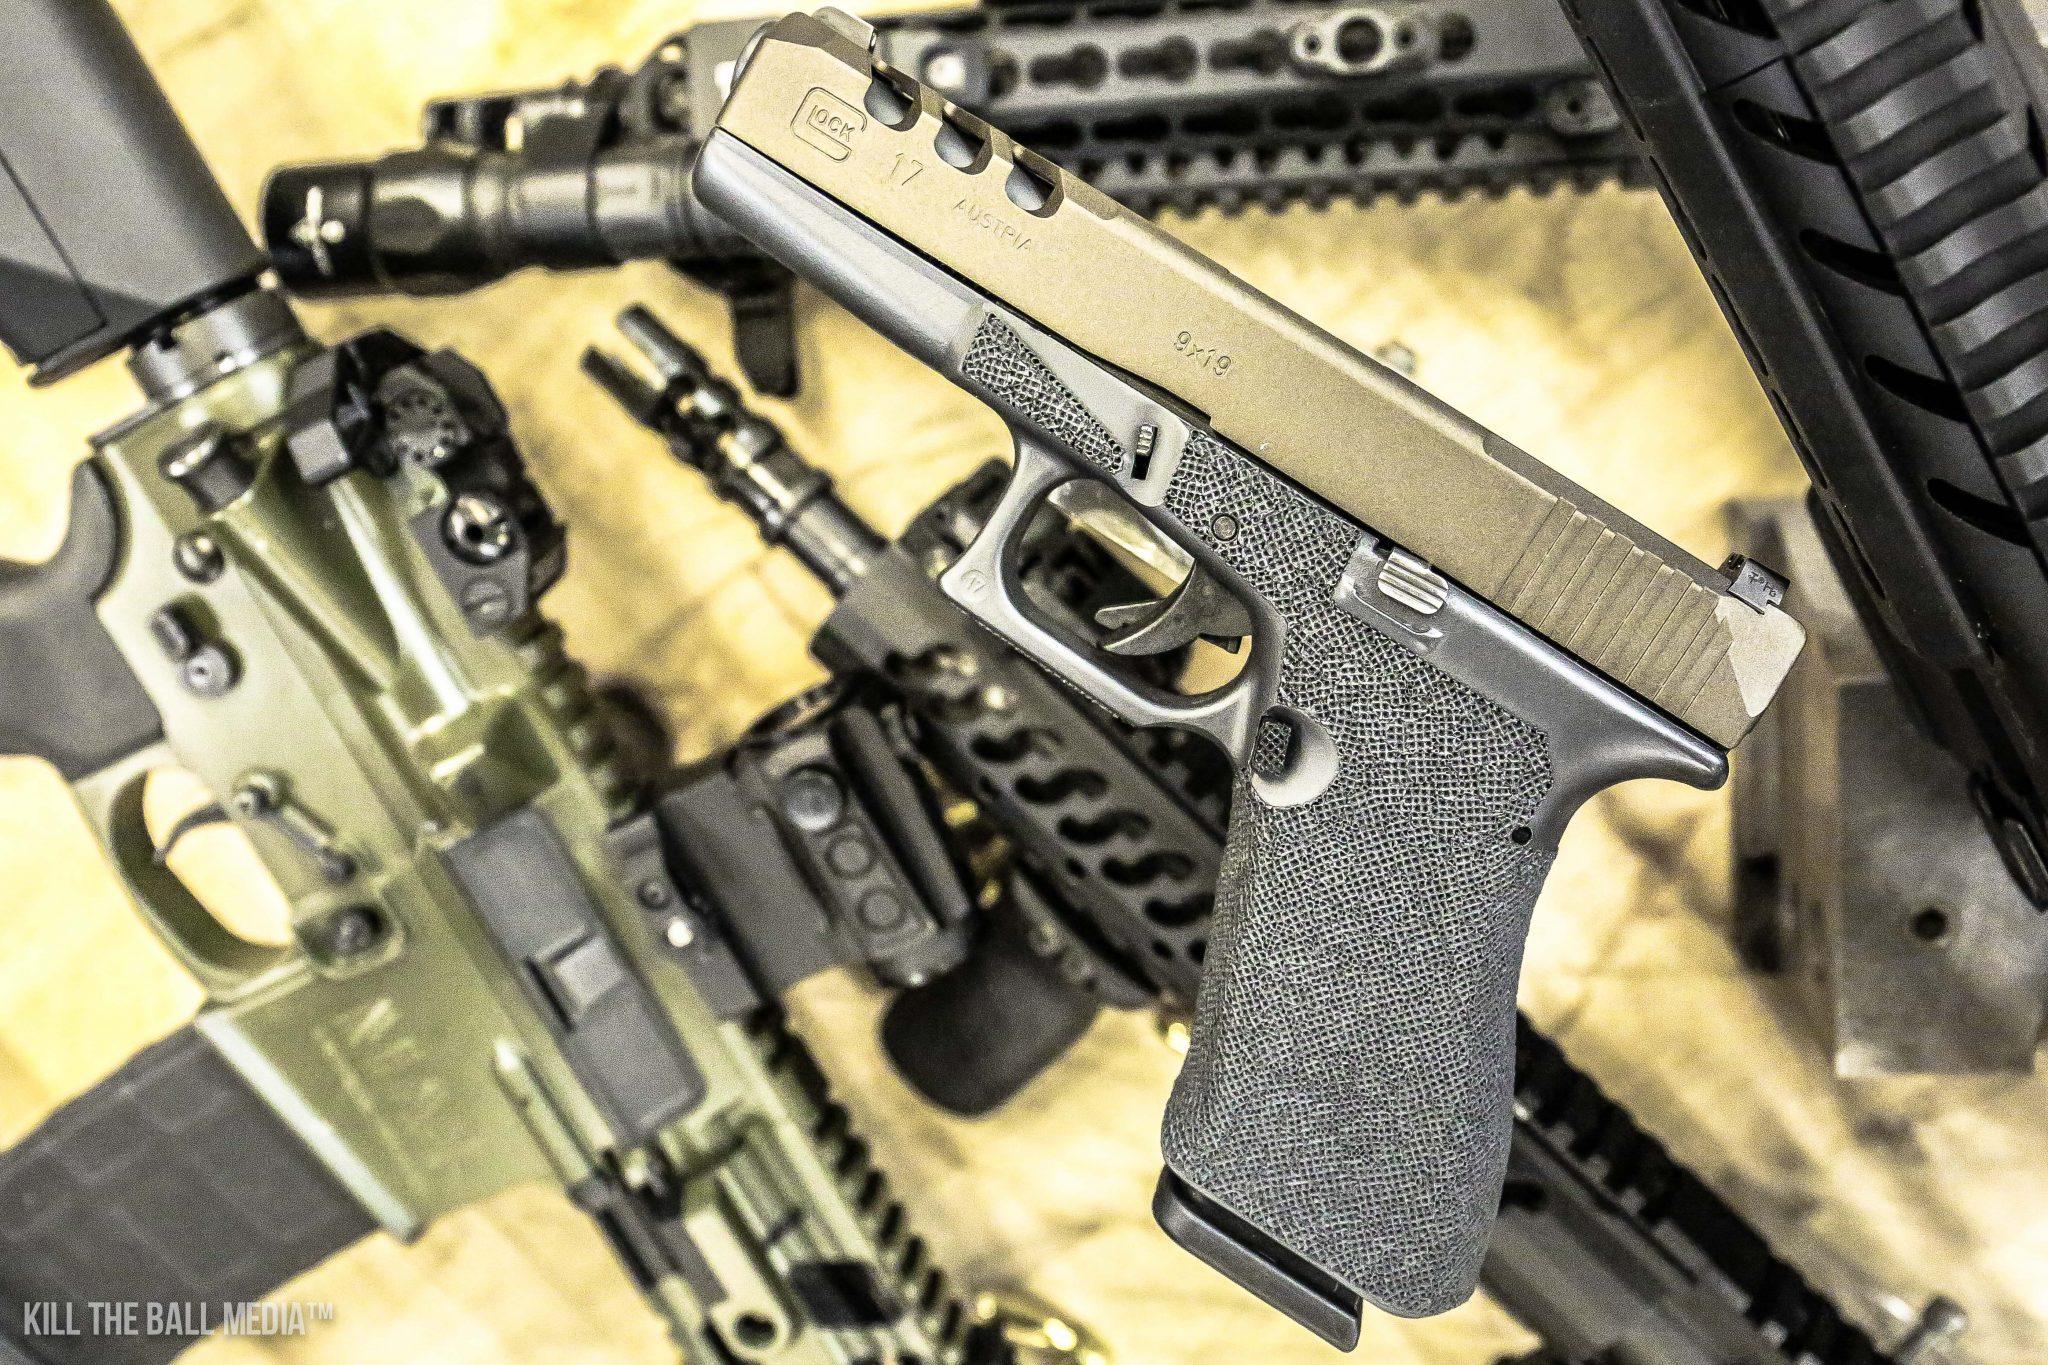 Pullman Arms Glock Raffle